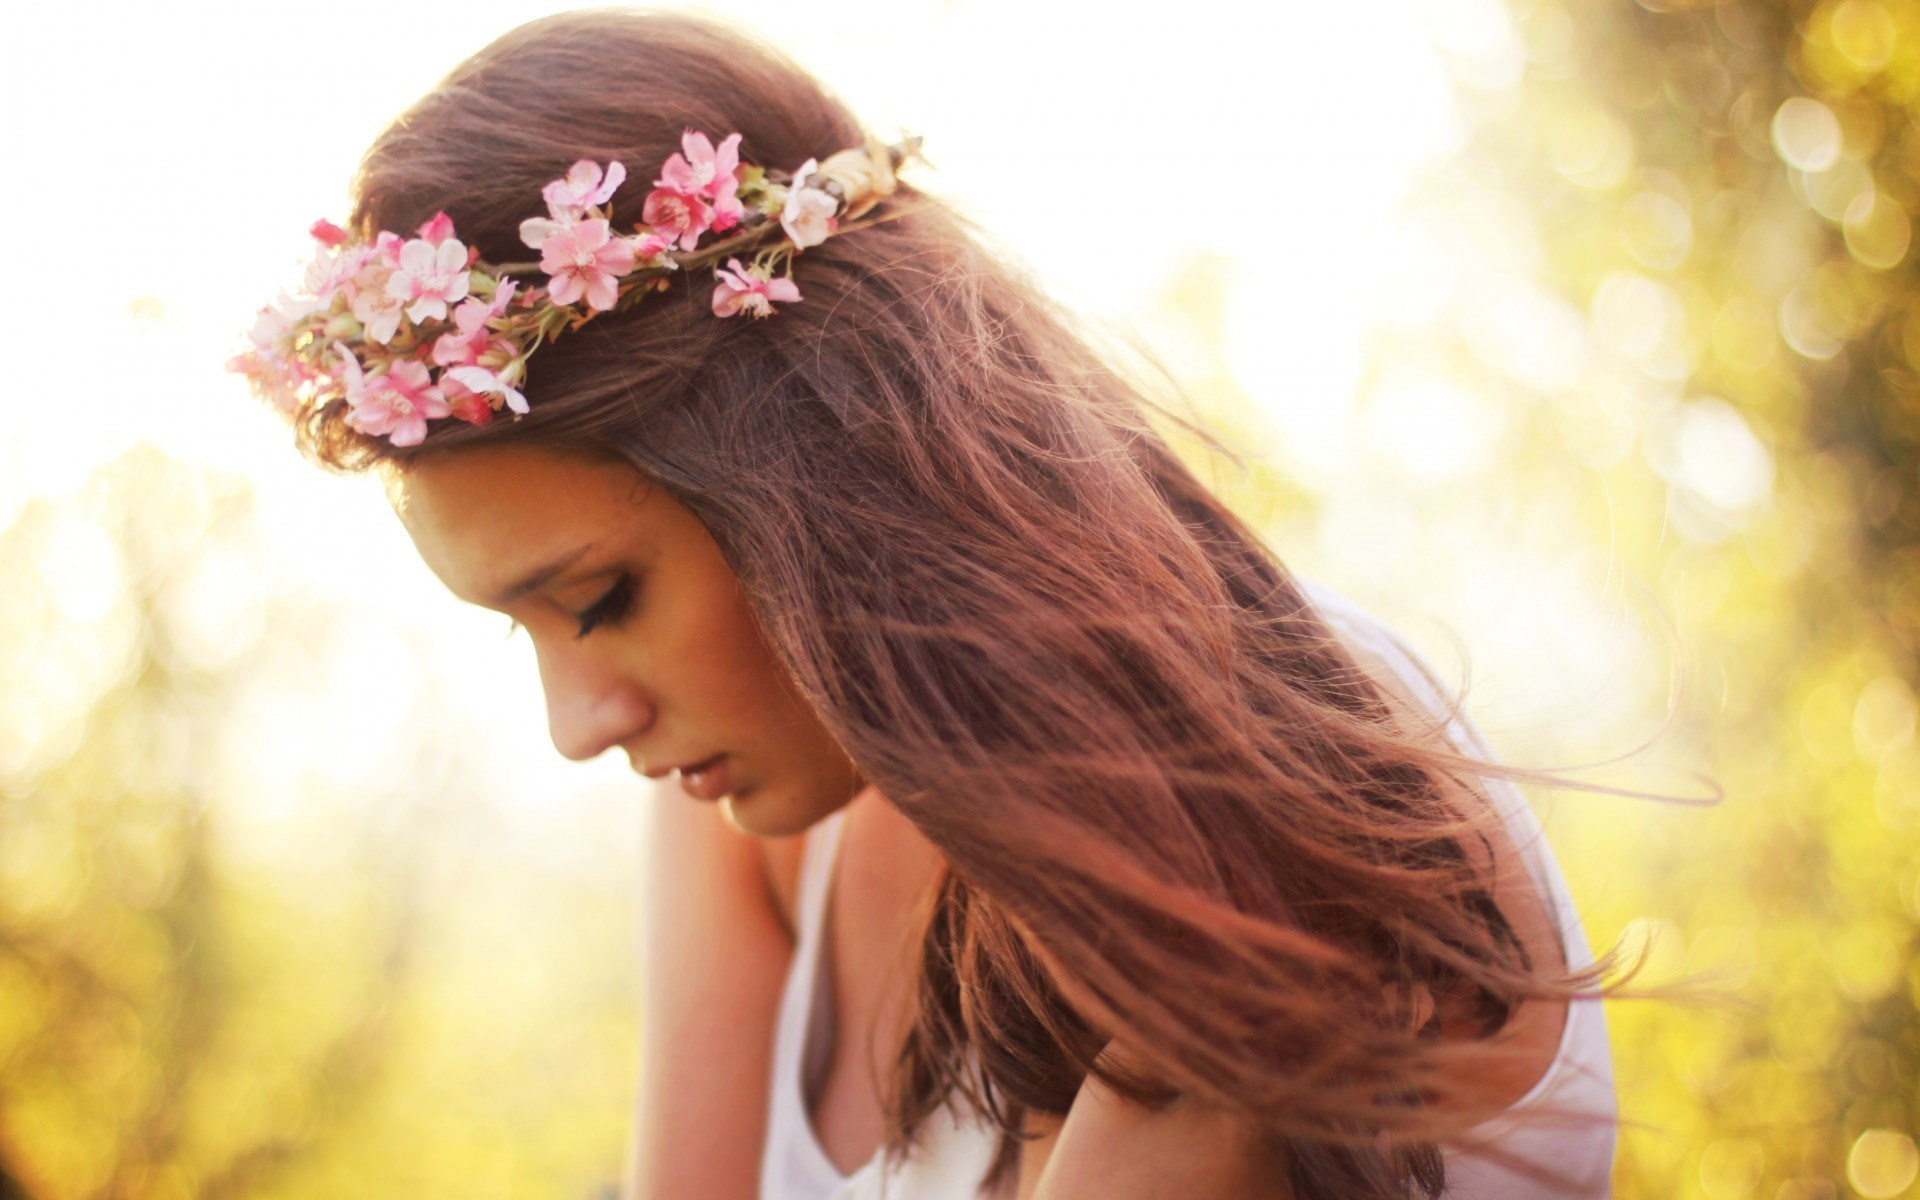 Girl Blonde Flowers Wreath